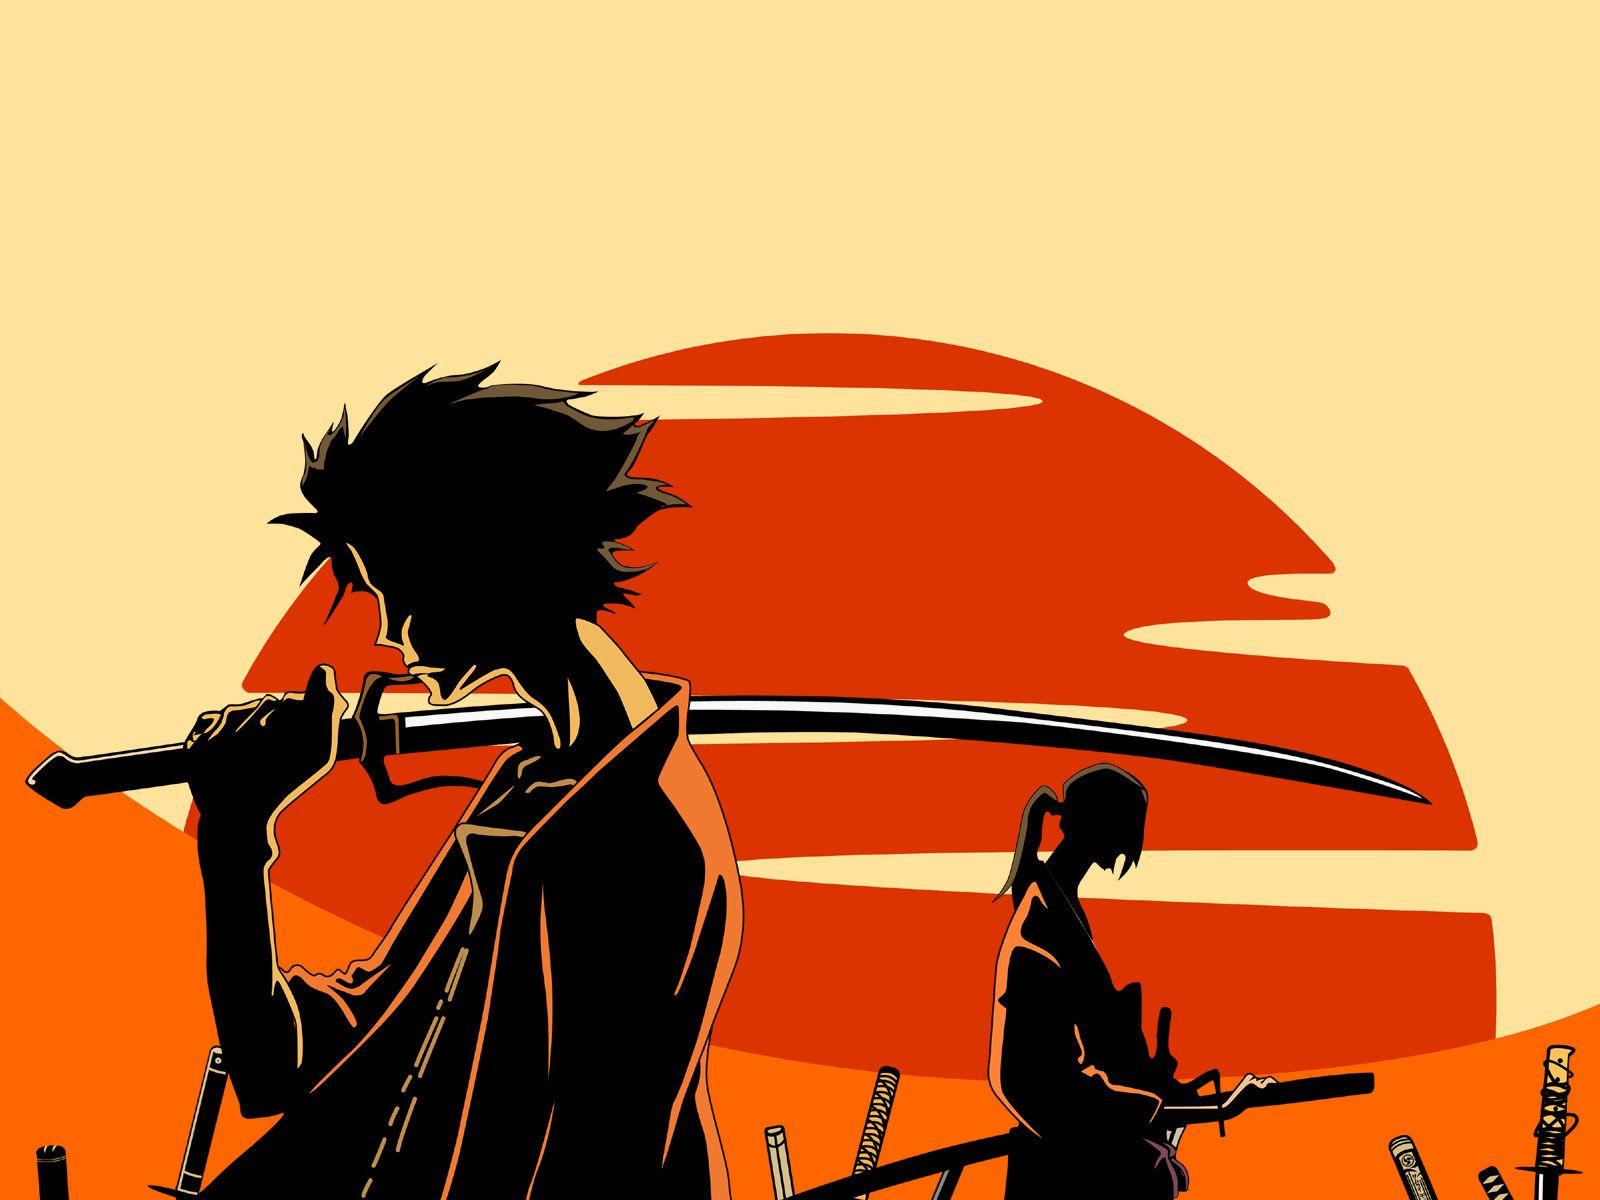 Samurai Champloo Wallpapers Hd Free Download Samurai Anime Samurai Champloo Anime